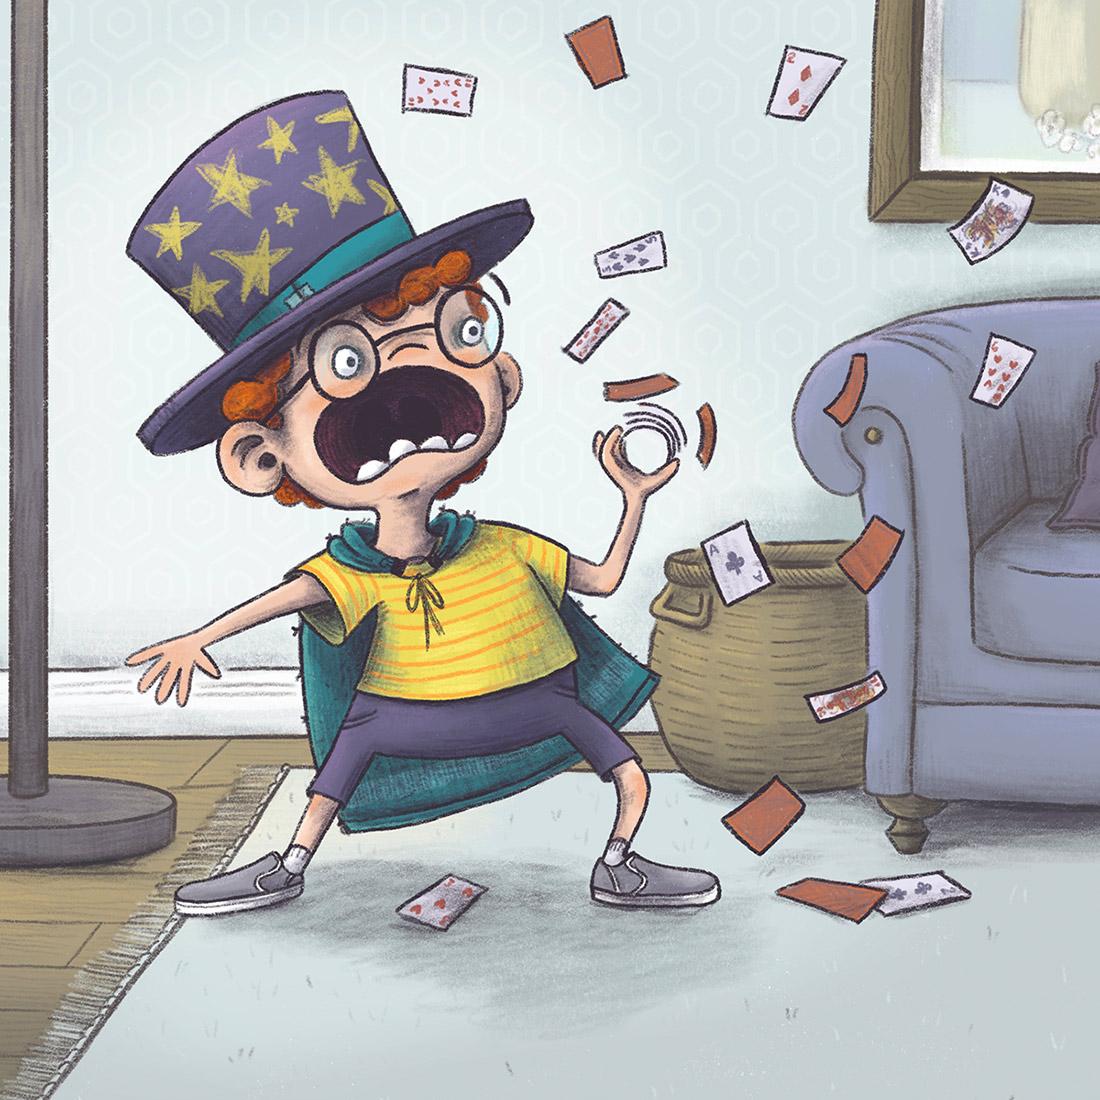 kid magic funny card trick children's book illustration champaign Illinois midwest